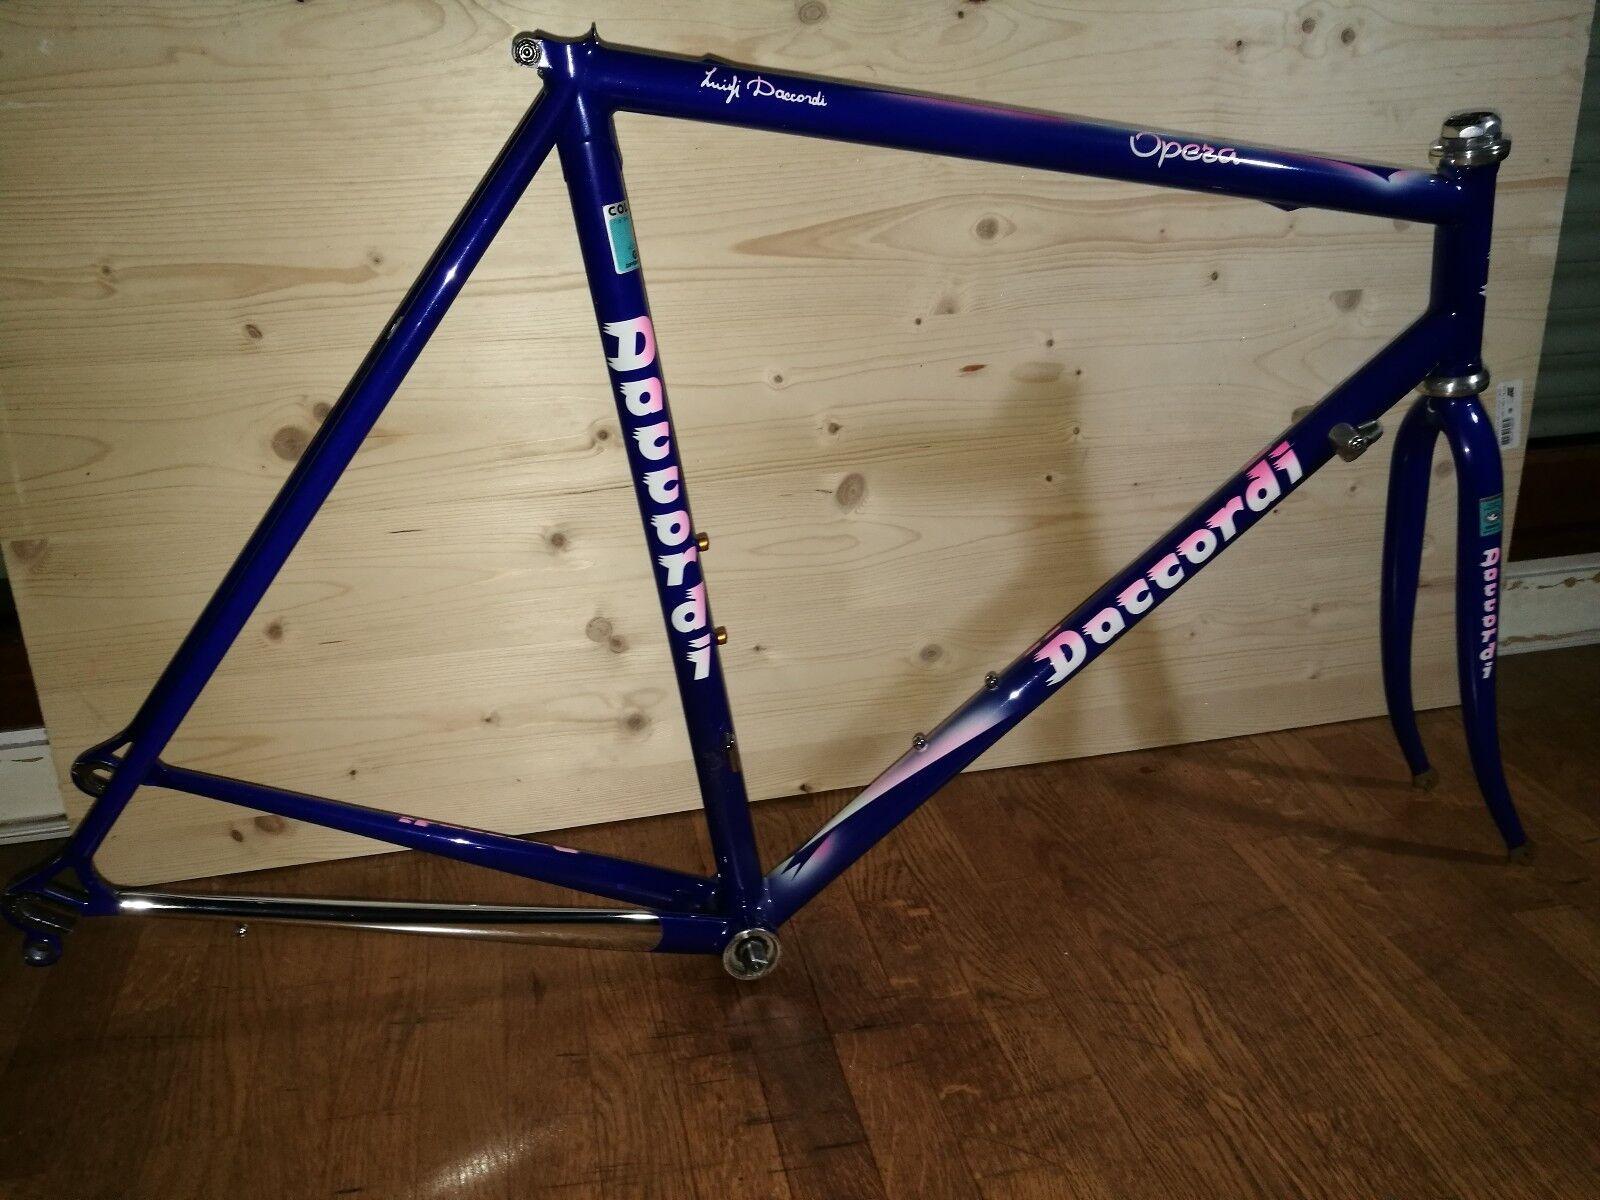 Daccordi Opéra Road Bike Frameset cadre Columbus Genius + Campagnolo parts